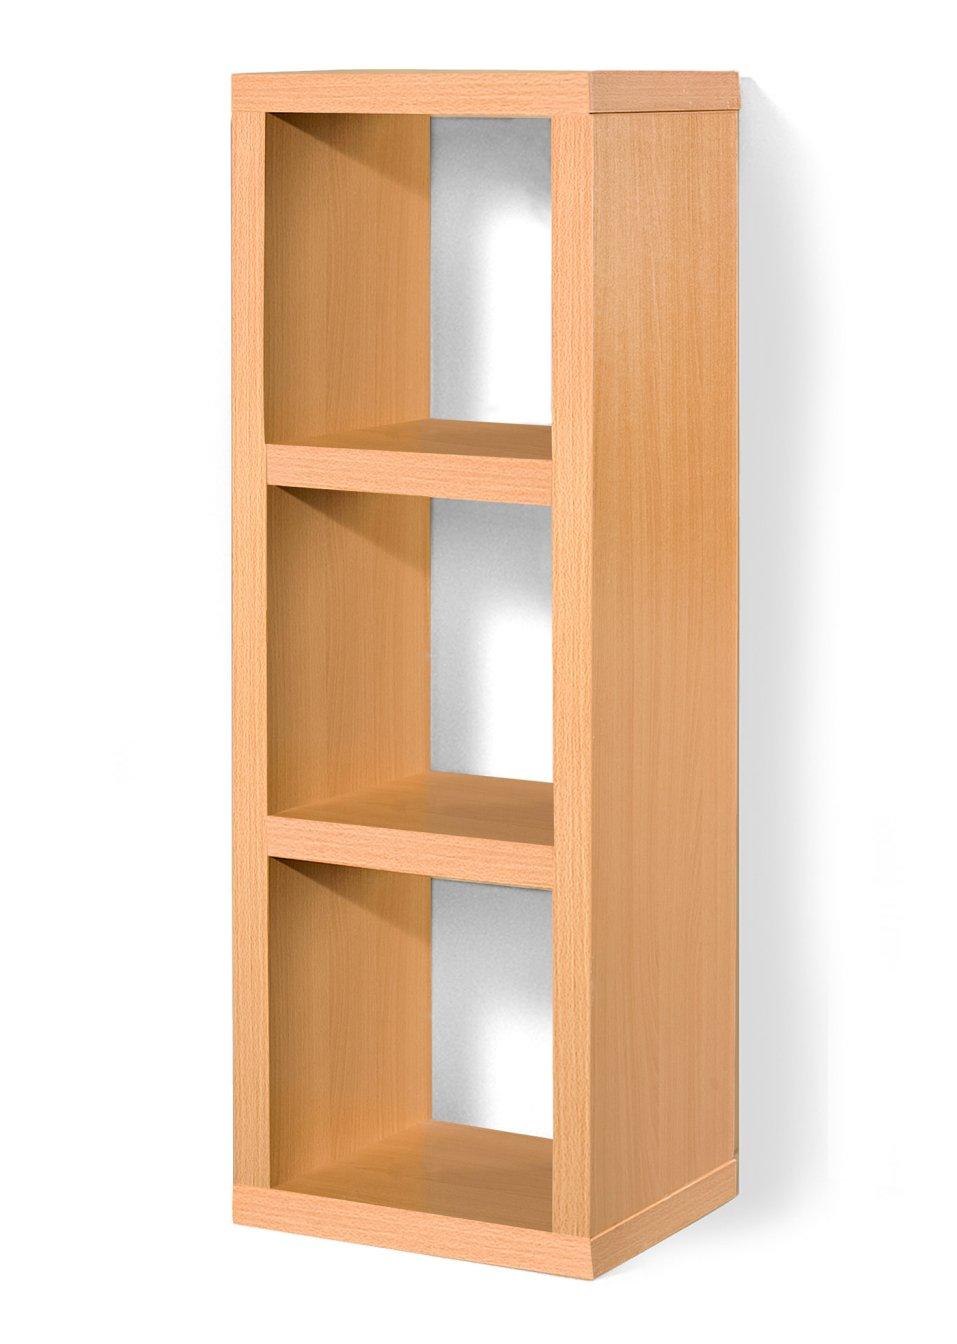 allesk nner in w rfelform regal kenia 3 f cher buche mit 3 f chern. Black Bedroom Furniture Sets. Home Design Ideas